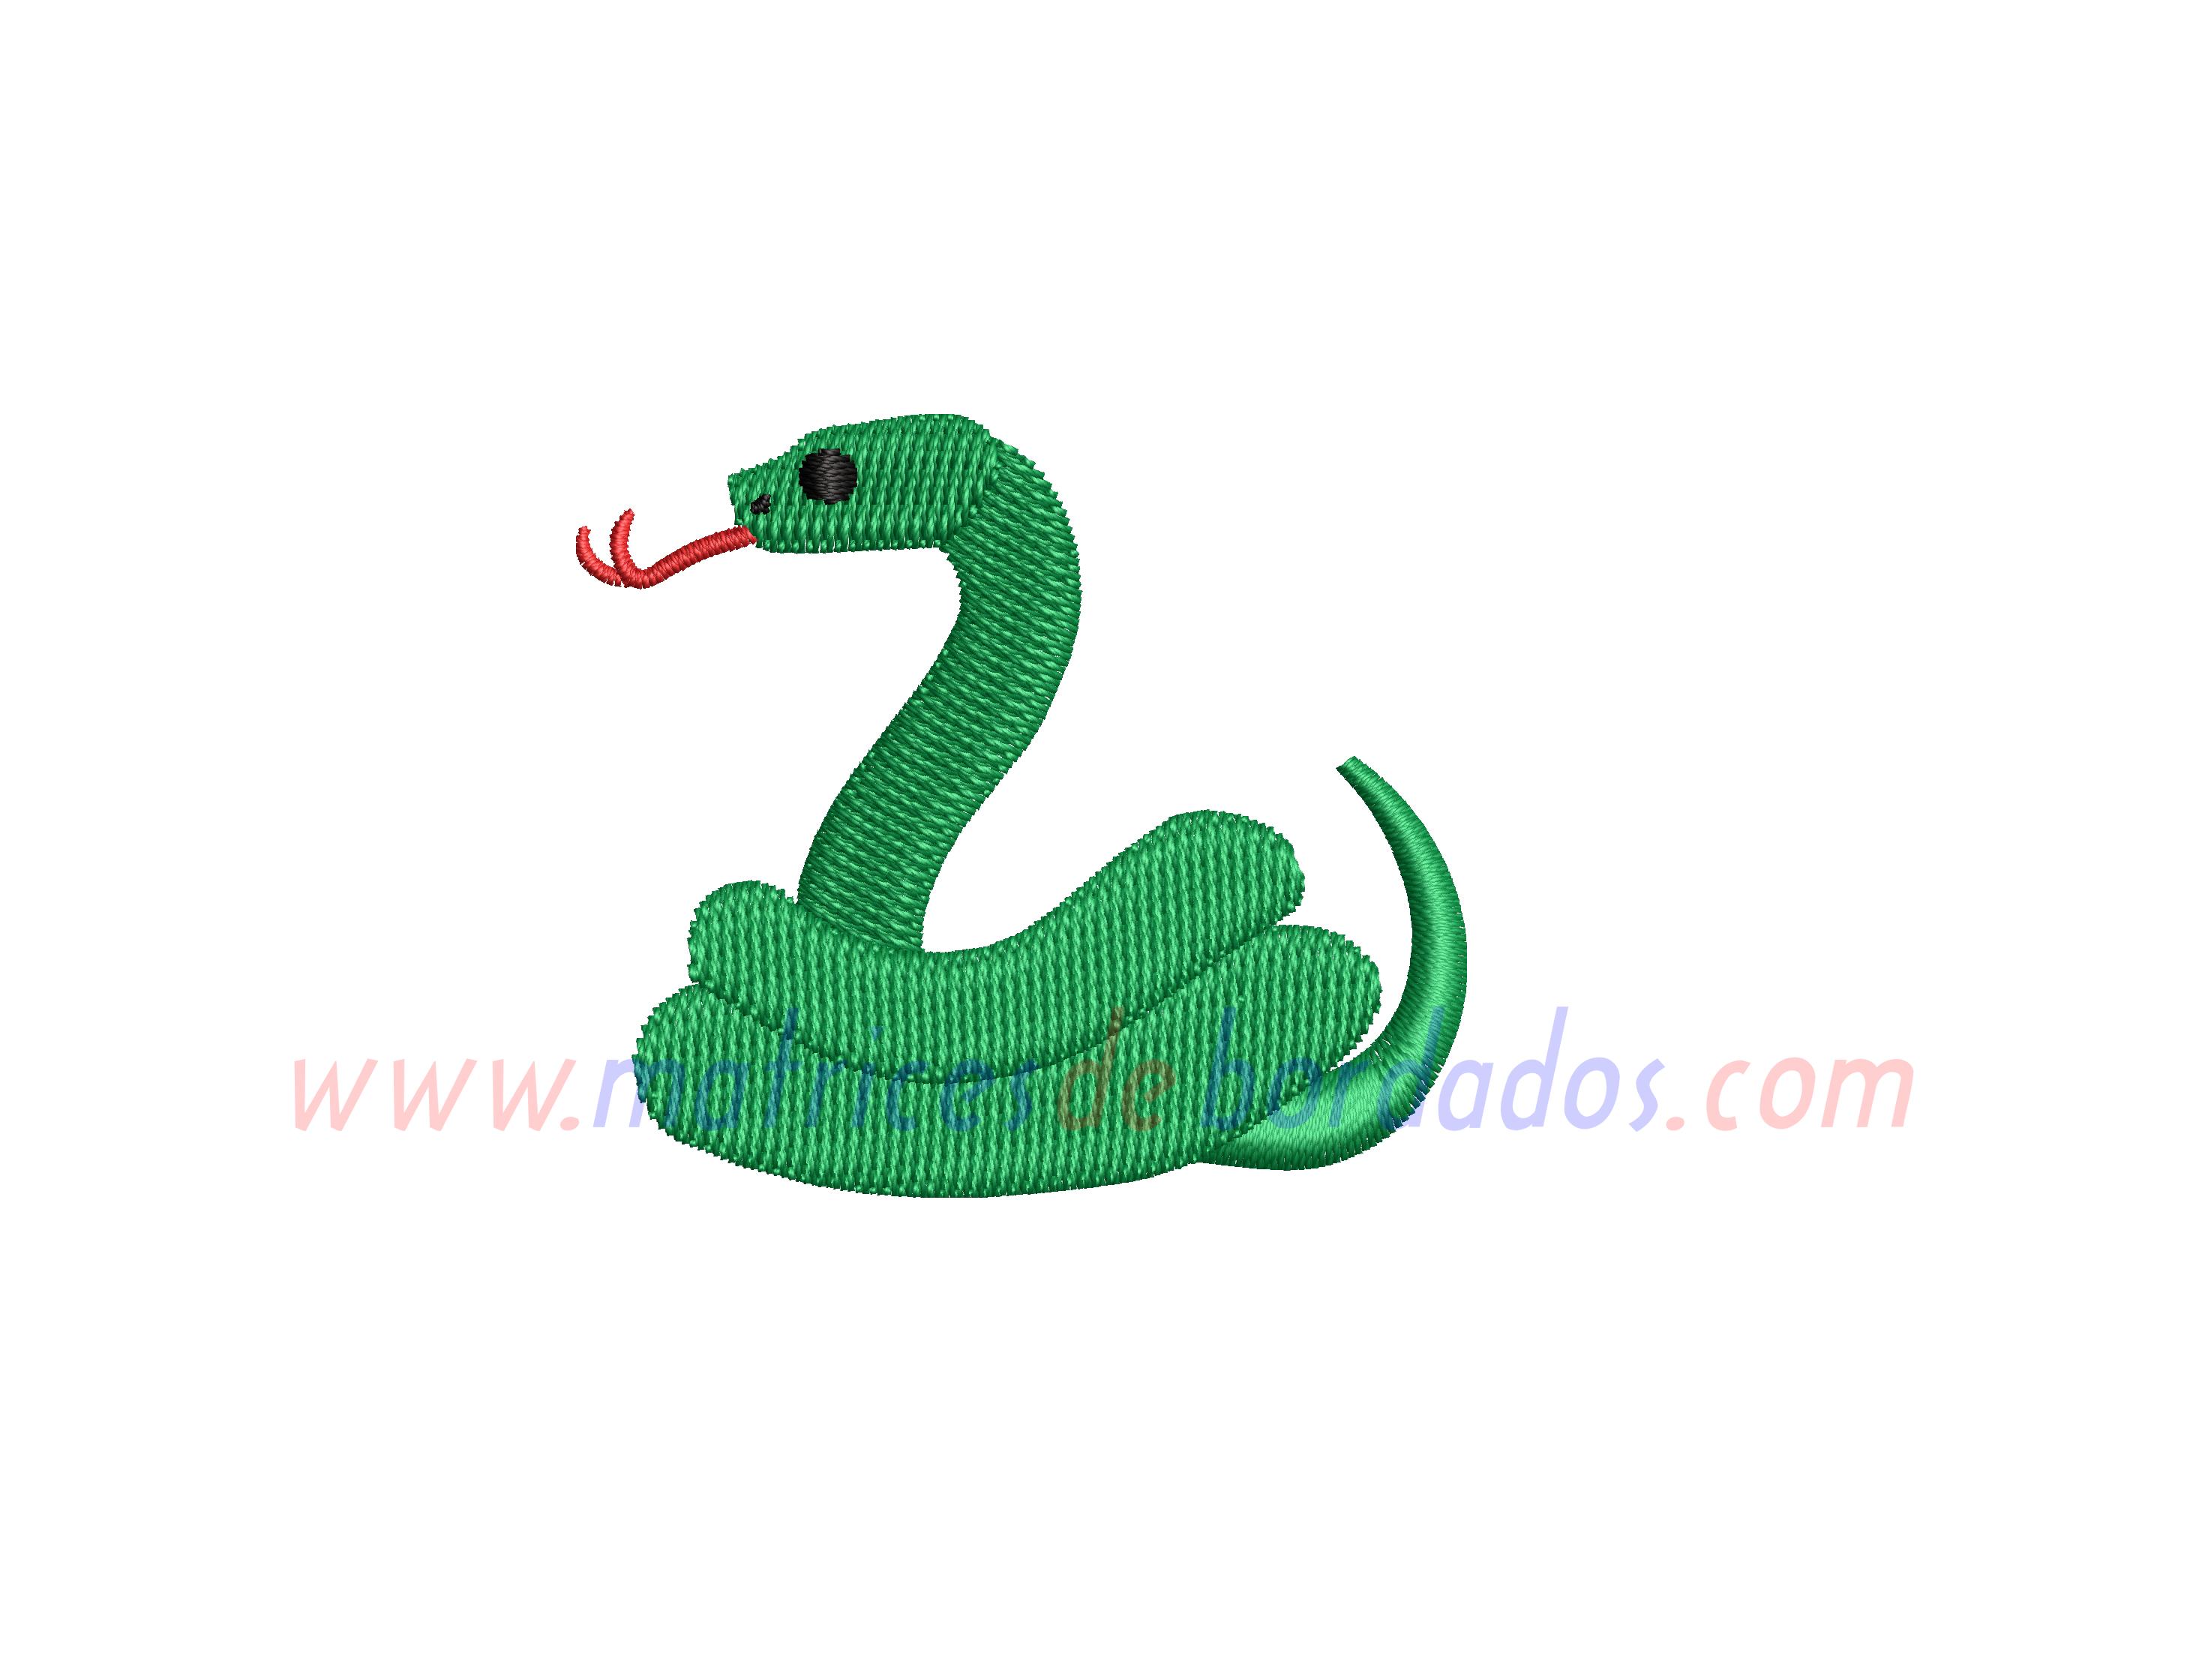 PZ92LJ - Serpiente